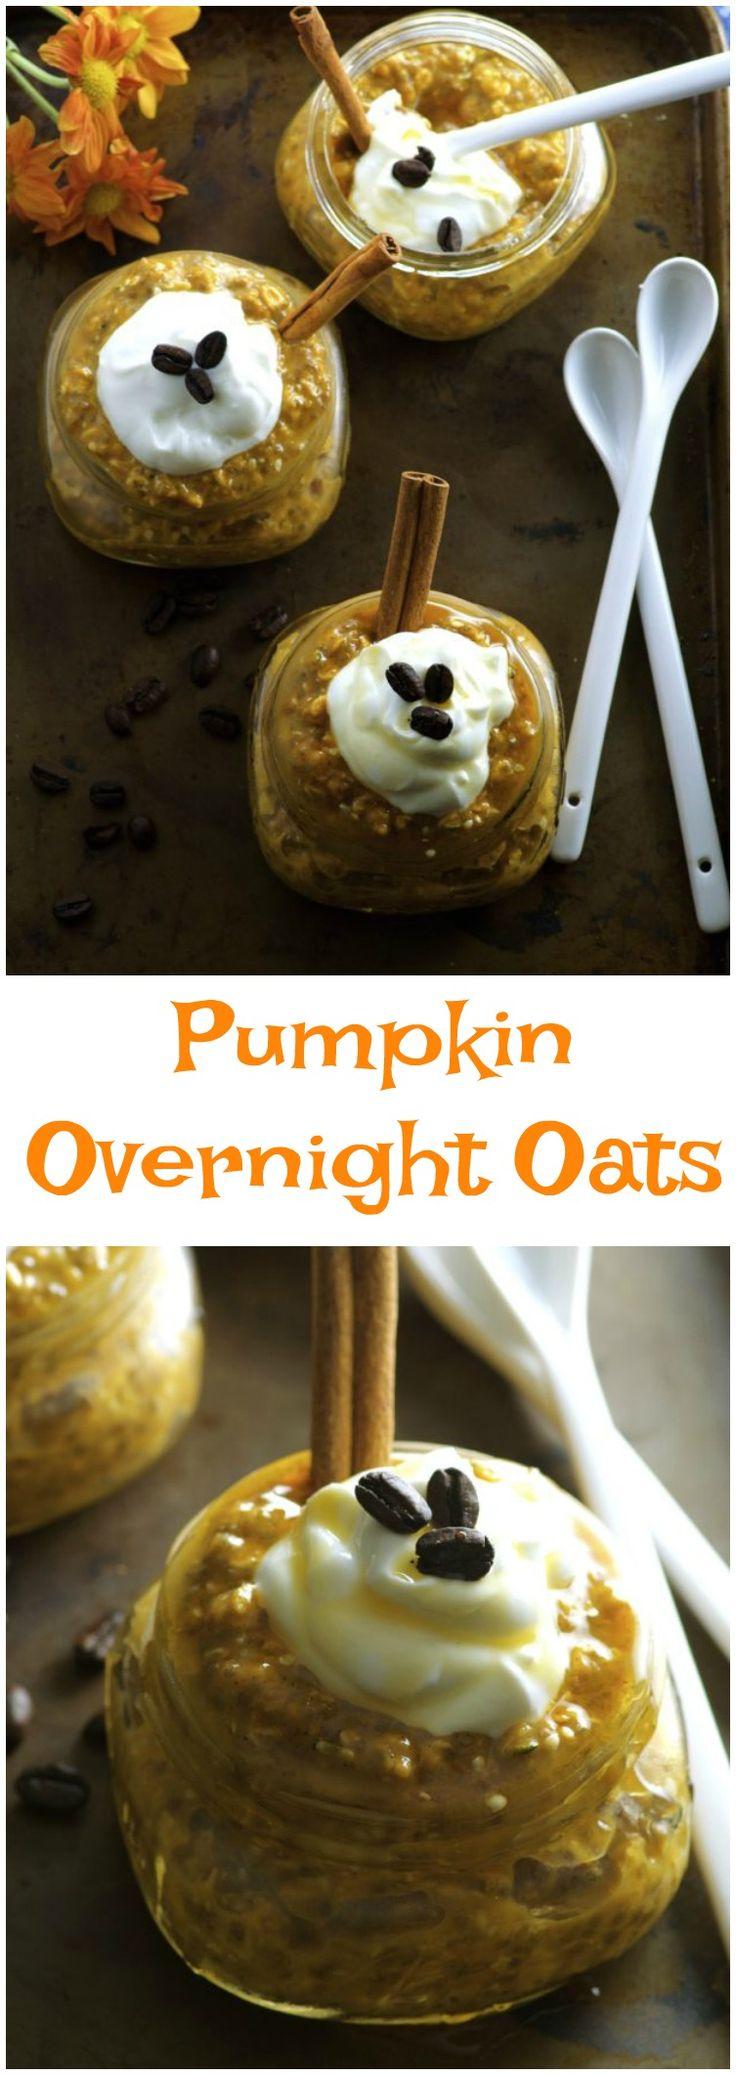 Are you a pumpkin spice lover? Do you also love co…